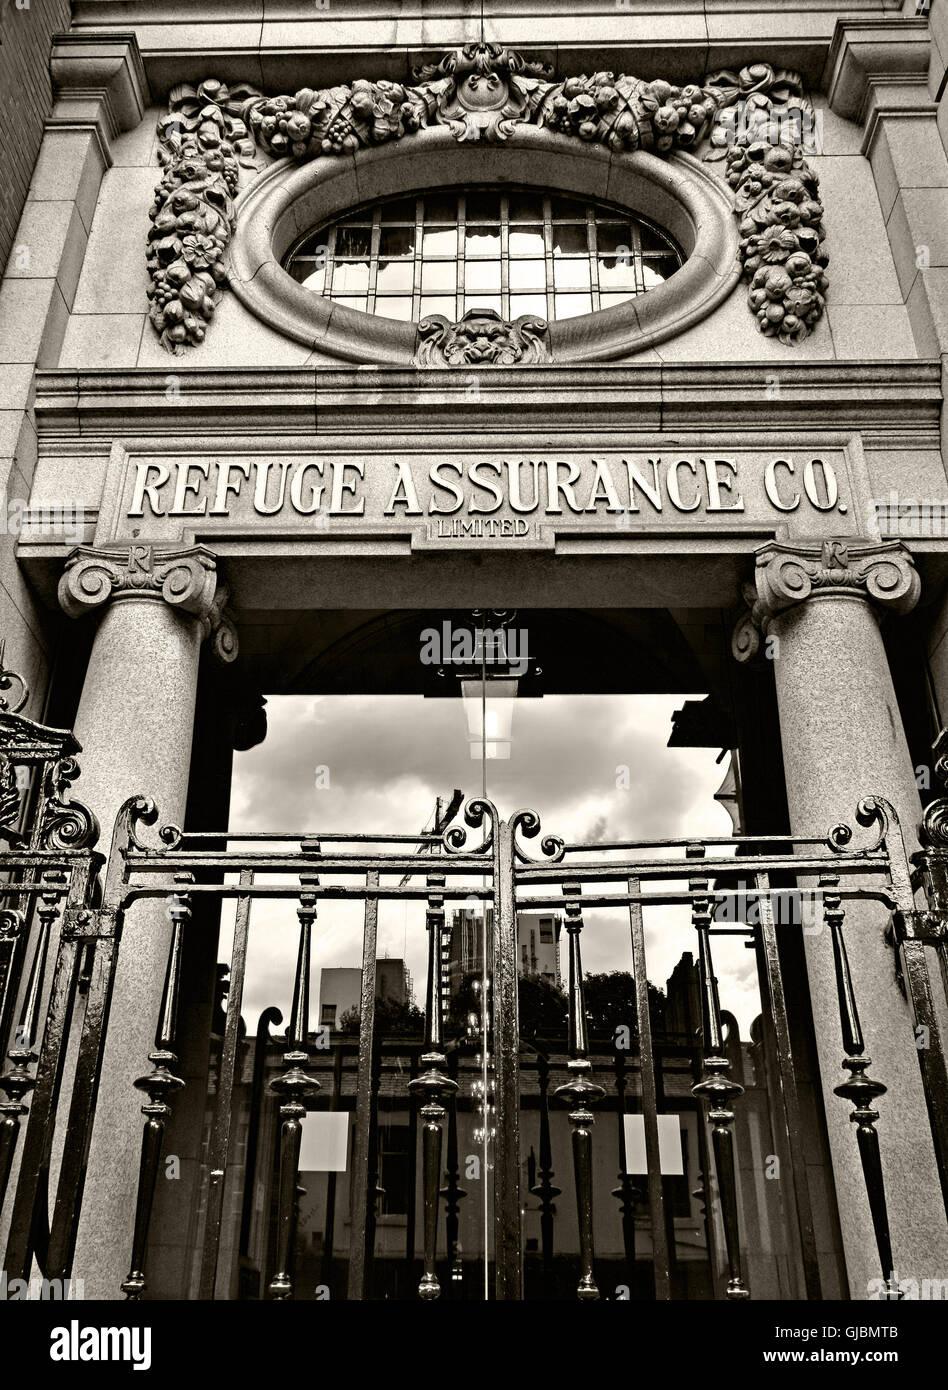 Laden Sie dieses Alamy Stockfoto Sepia Refuge Assurance Bürogebäude, Oxford Road Manchester, - GJBMTB